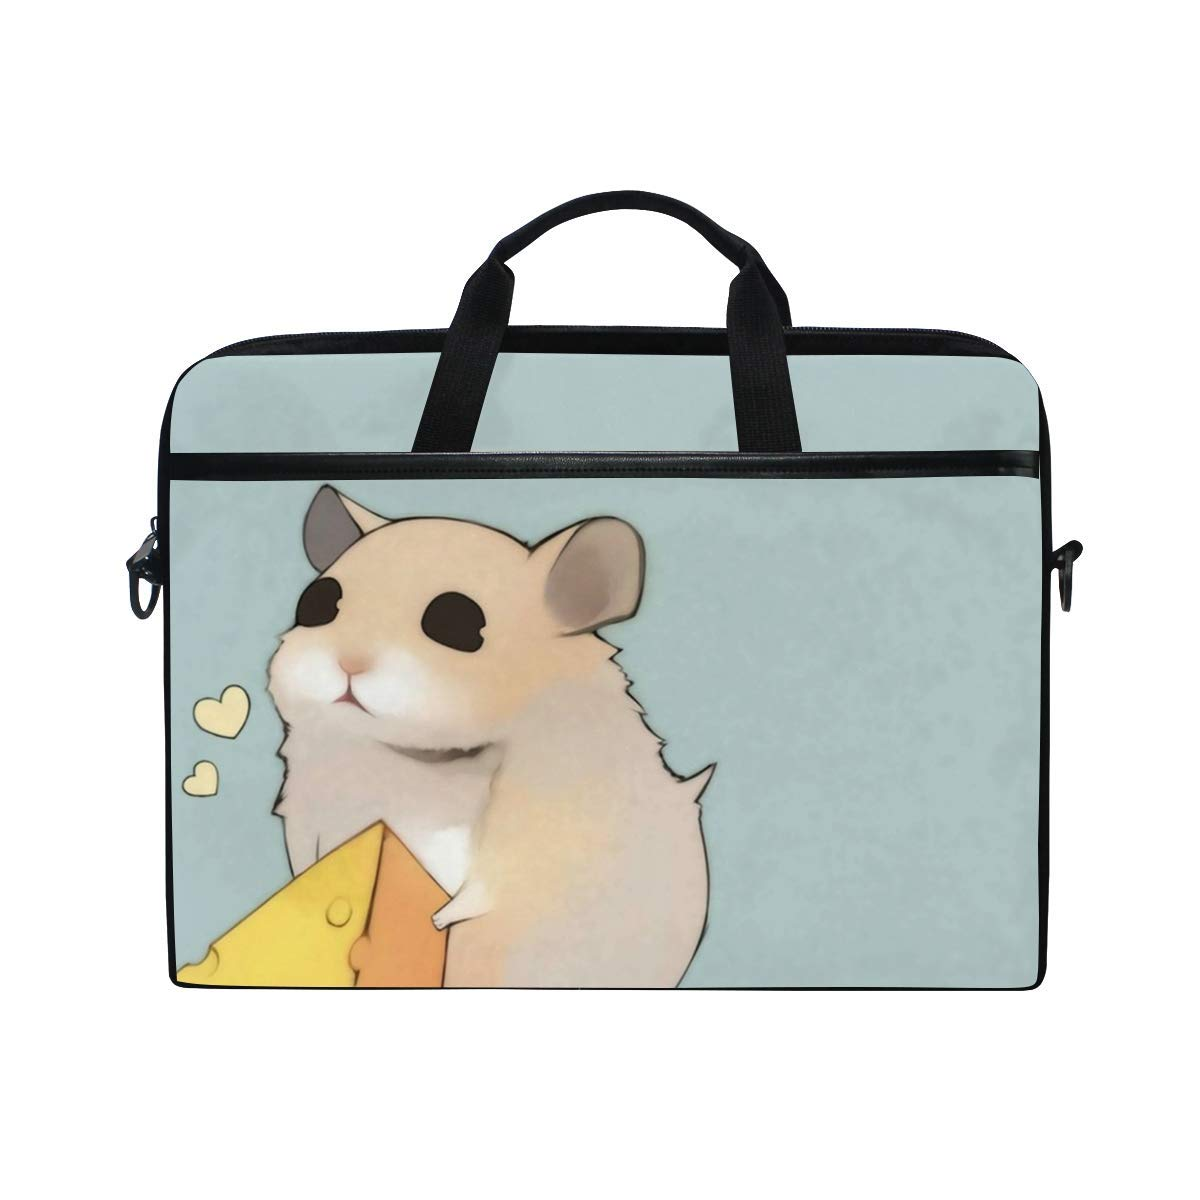 e3e8e52eab99 Cheap Laptop Bag Cute, find Laptop Bag Cute deals on line at Alibaba.com